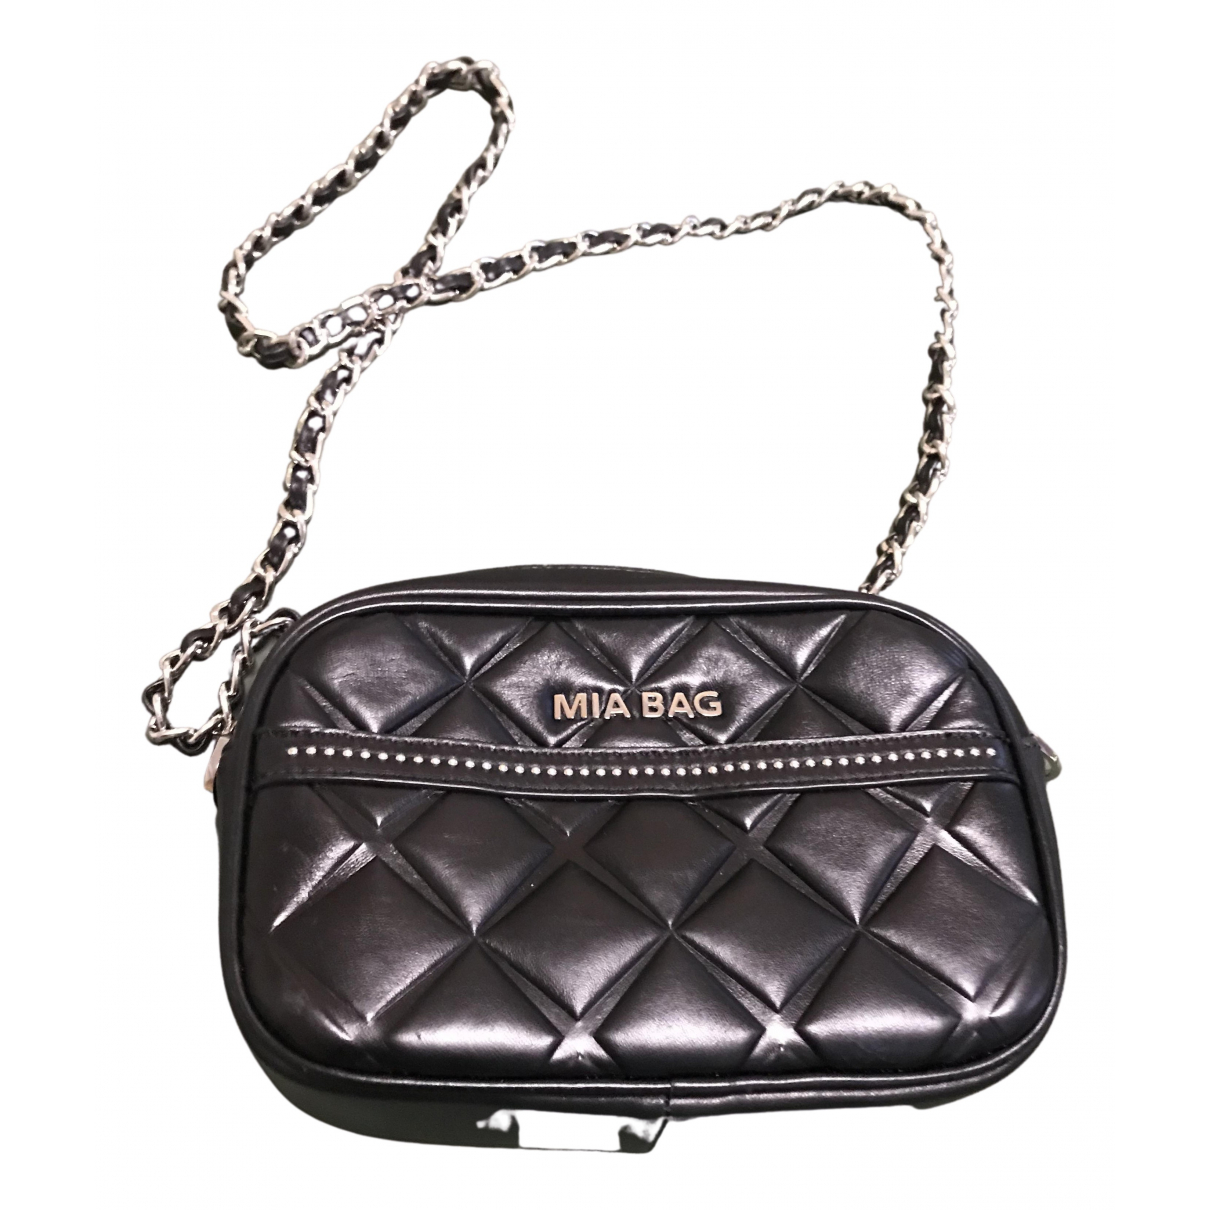 Mia Bag N Black Leather handbag for Women N